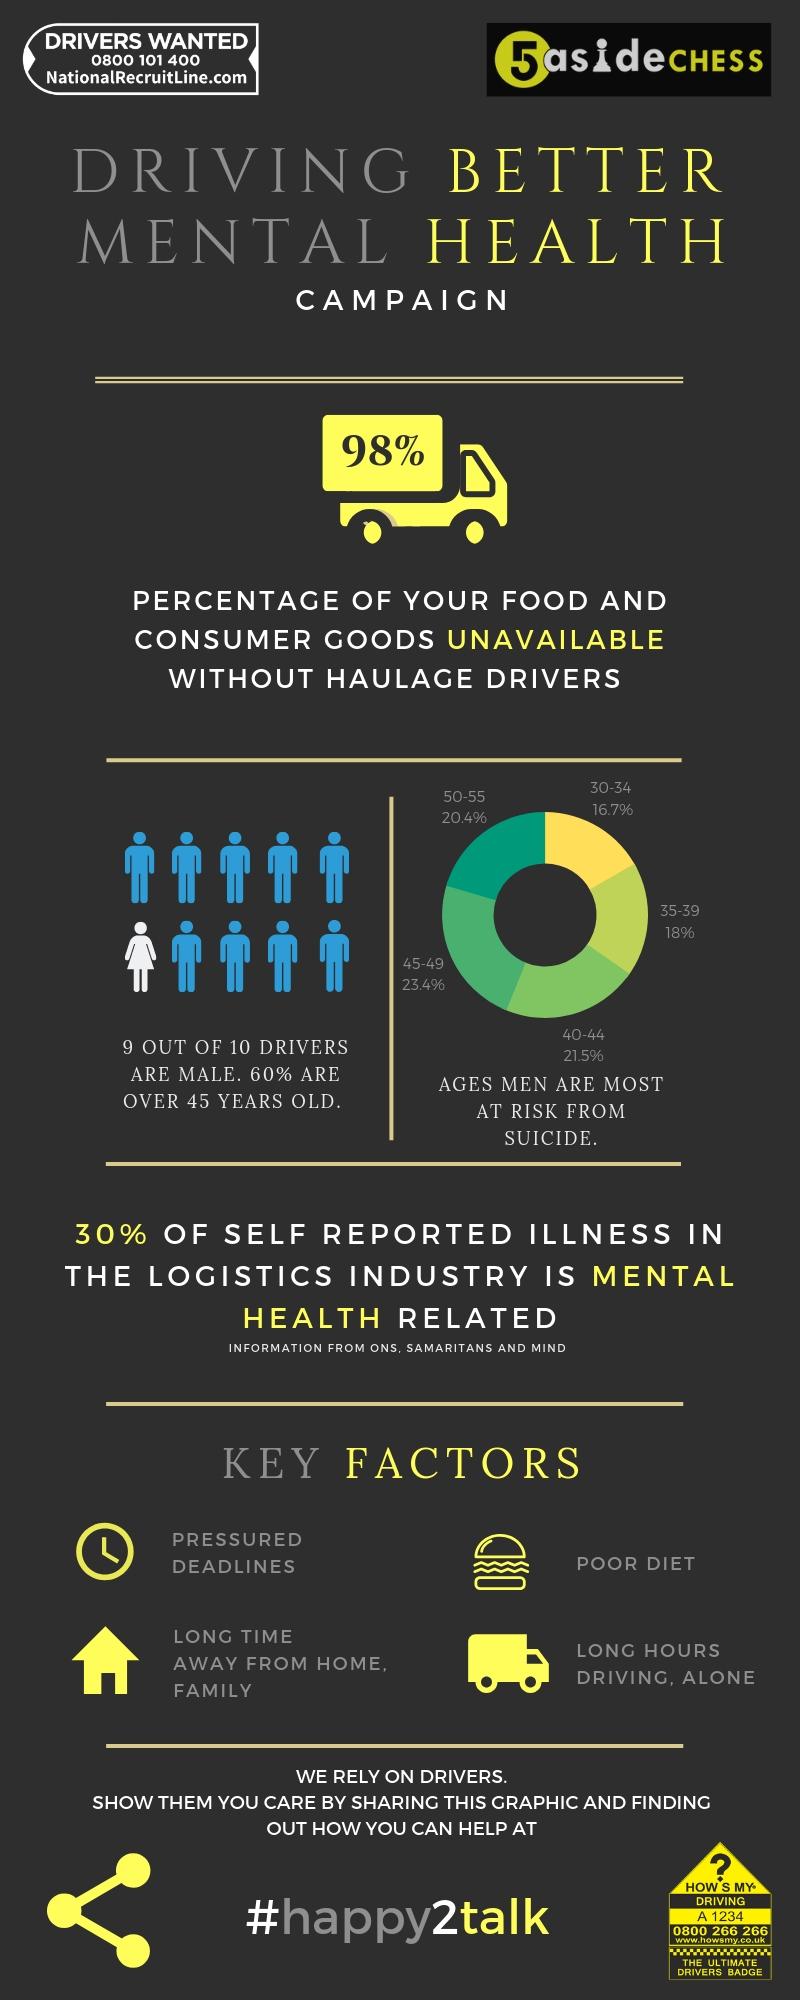 mental health and logistics